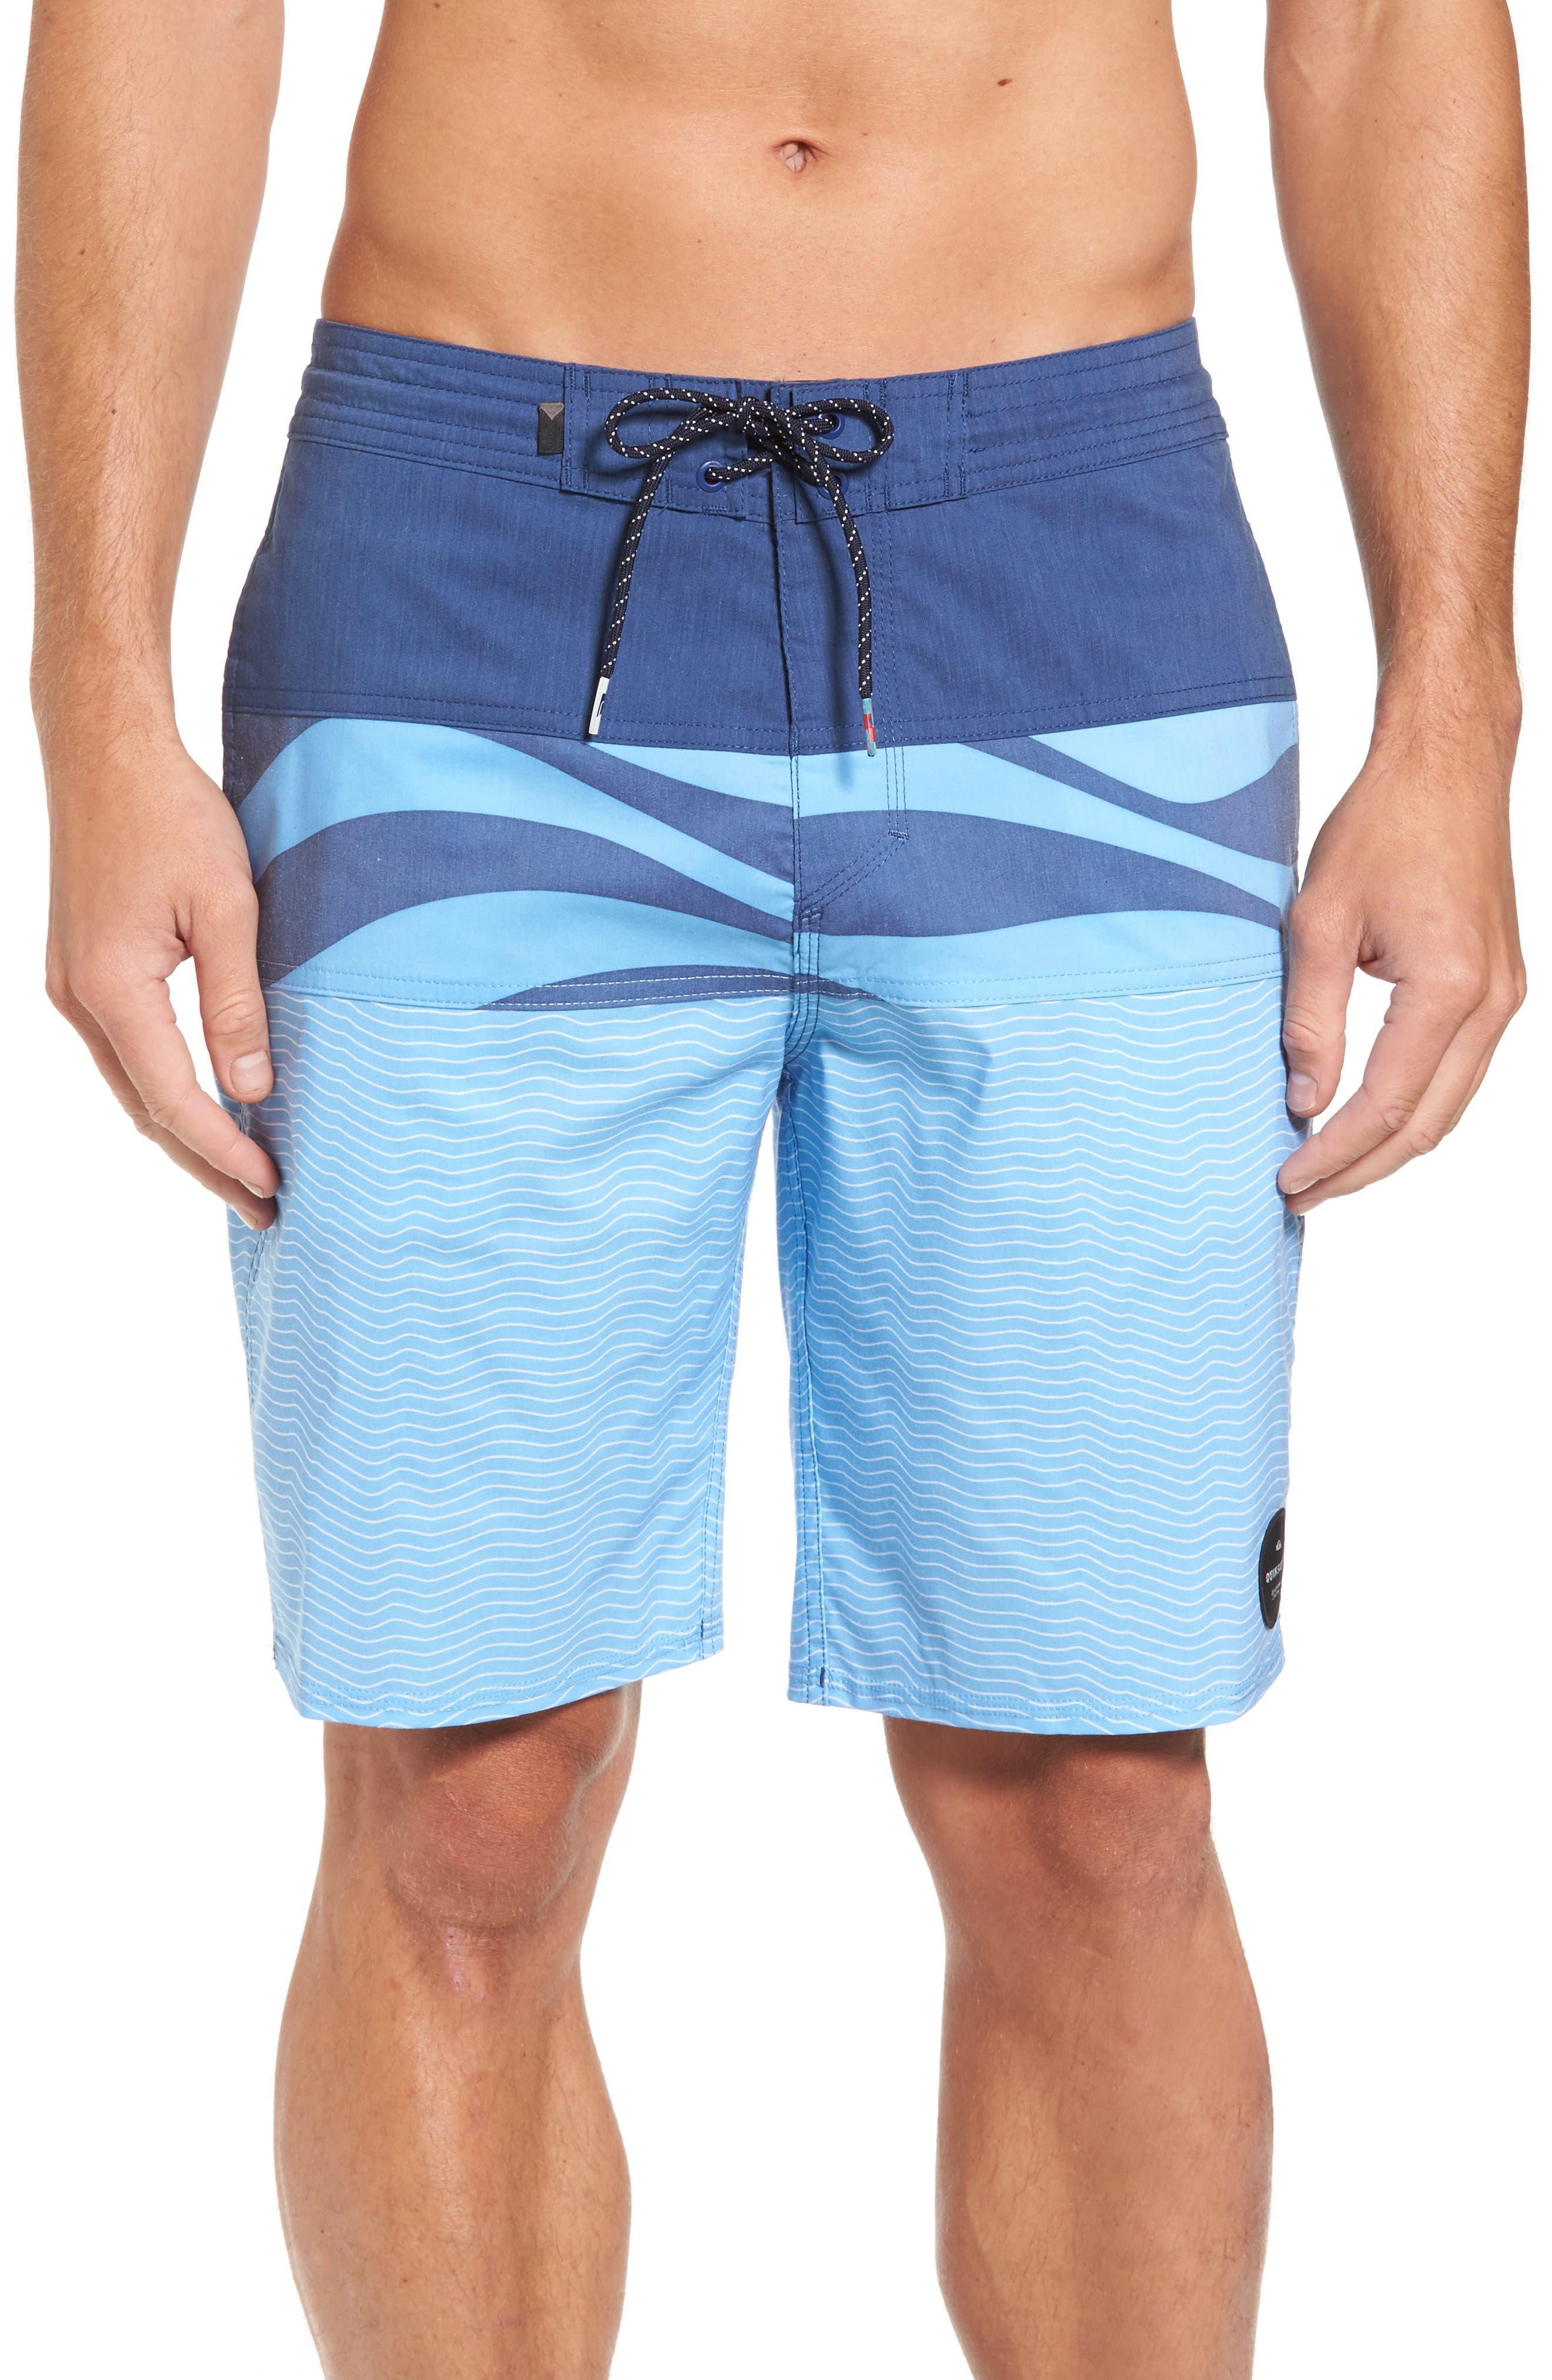 Alternate Image 1 Selected - Quiksilver Heatwave Blocked Board Shorts